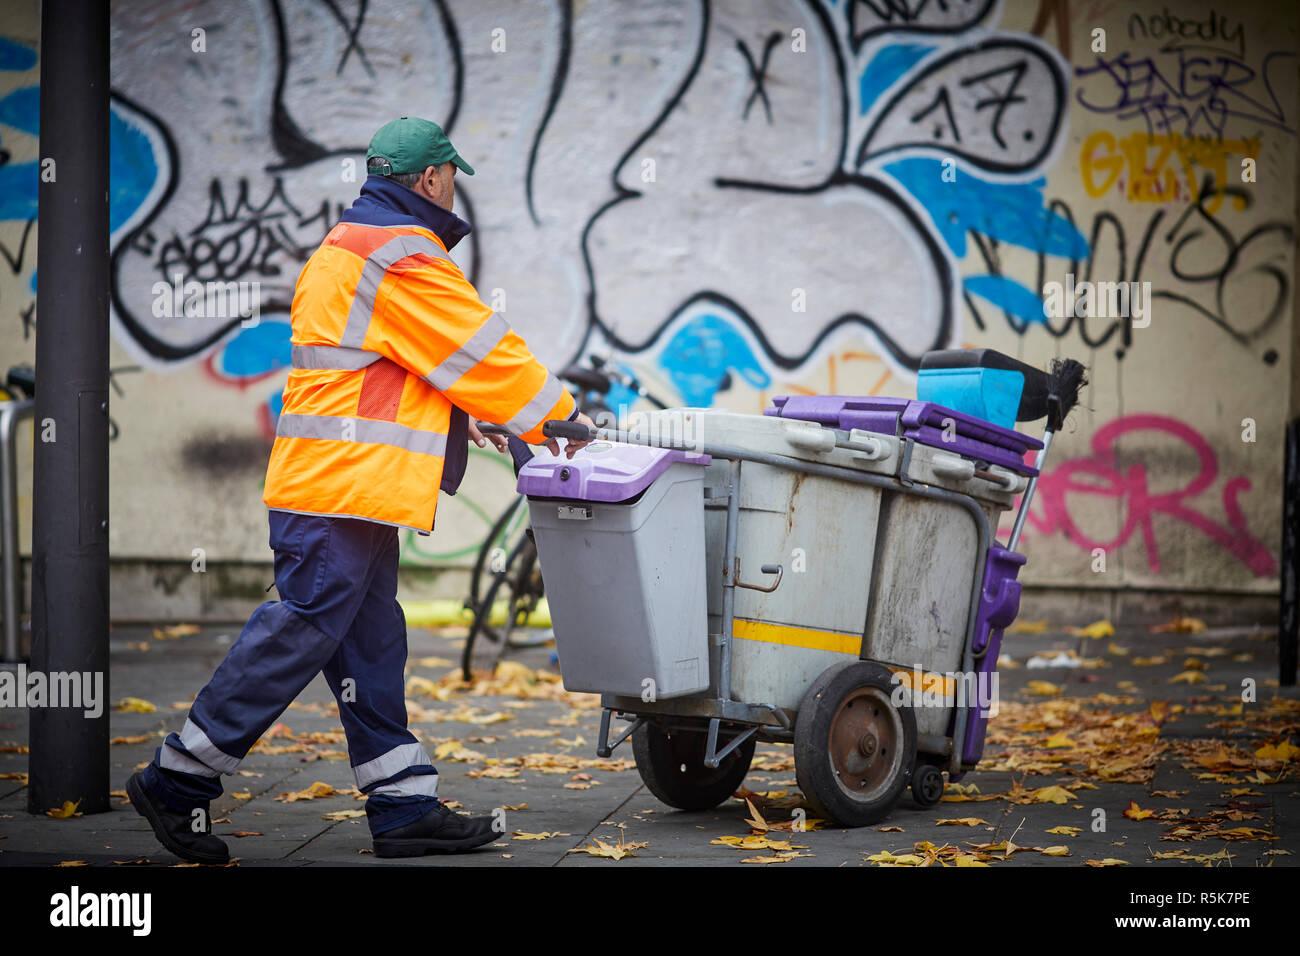 Liverpool city centre Bold Street littler picker pushing his bin cart past graffiti murals - Stock Image